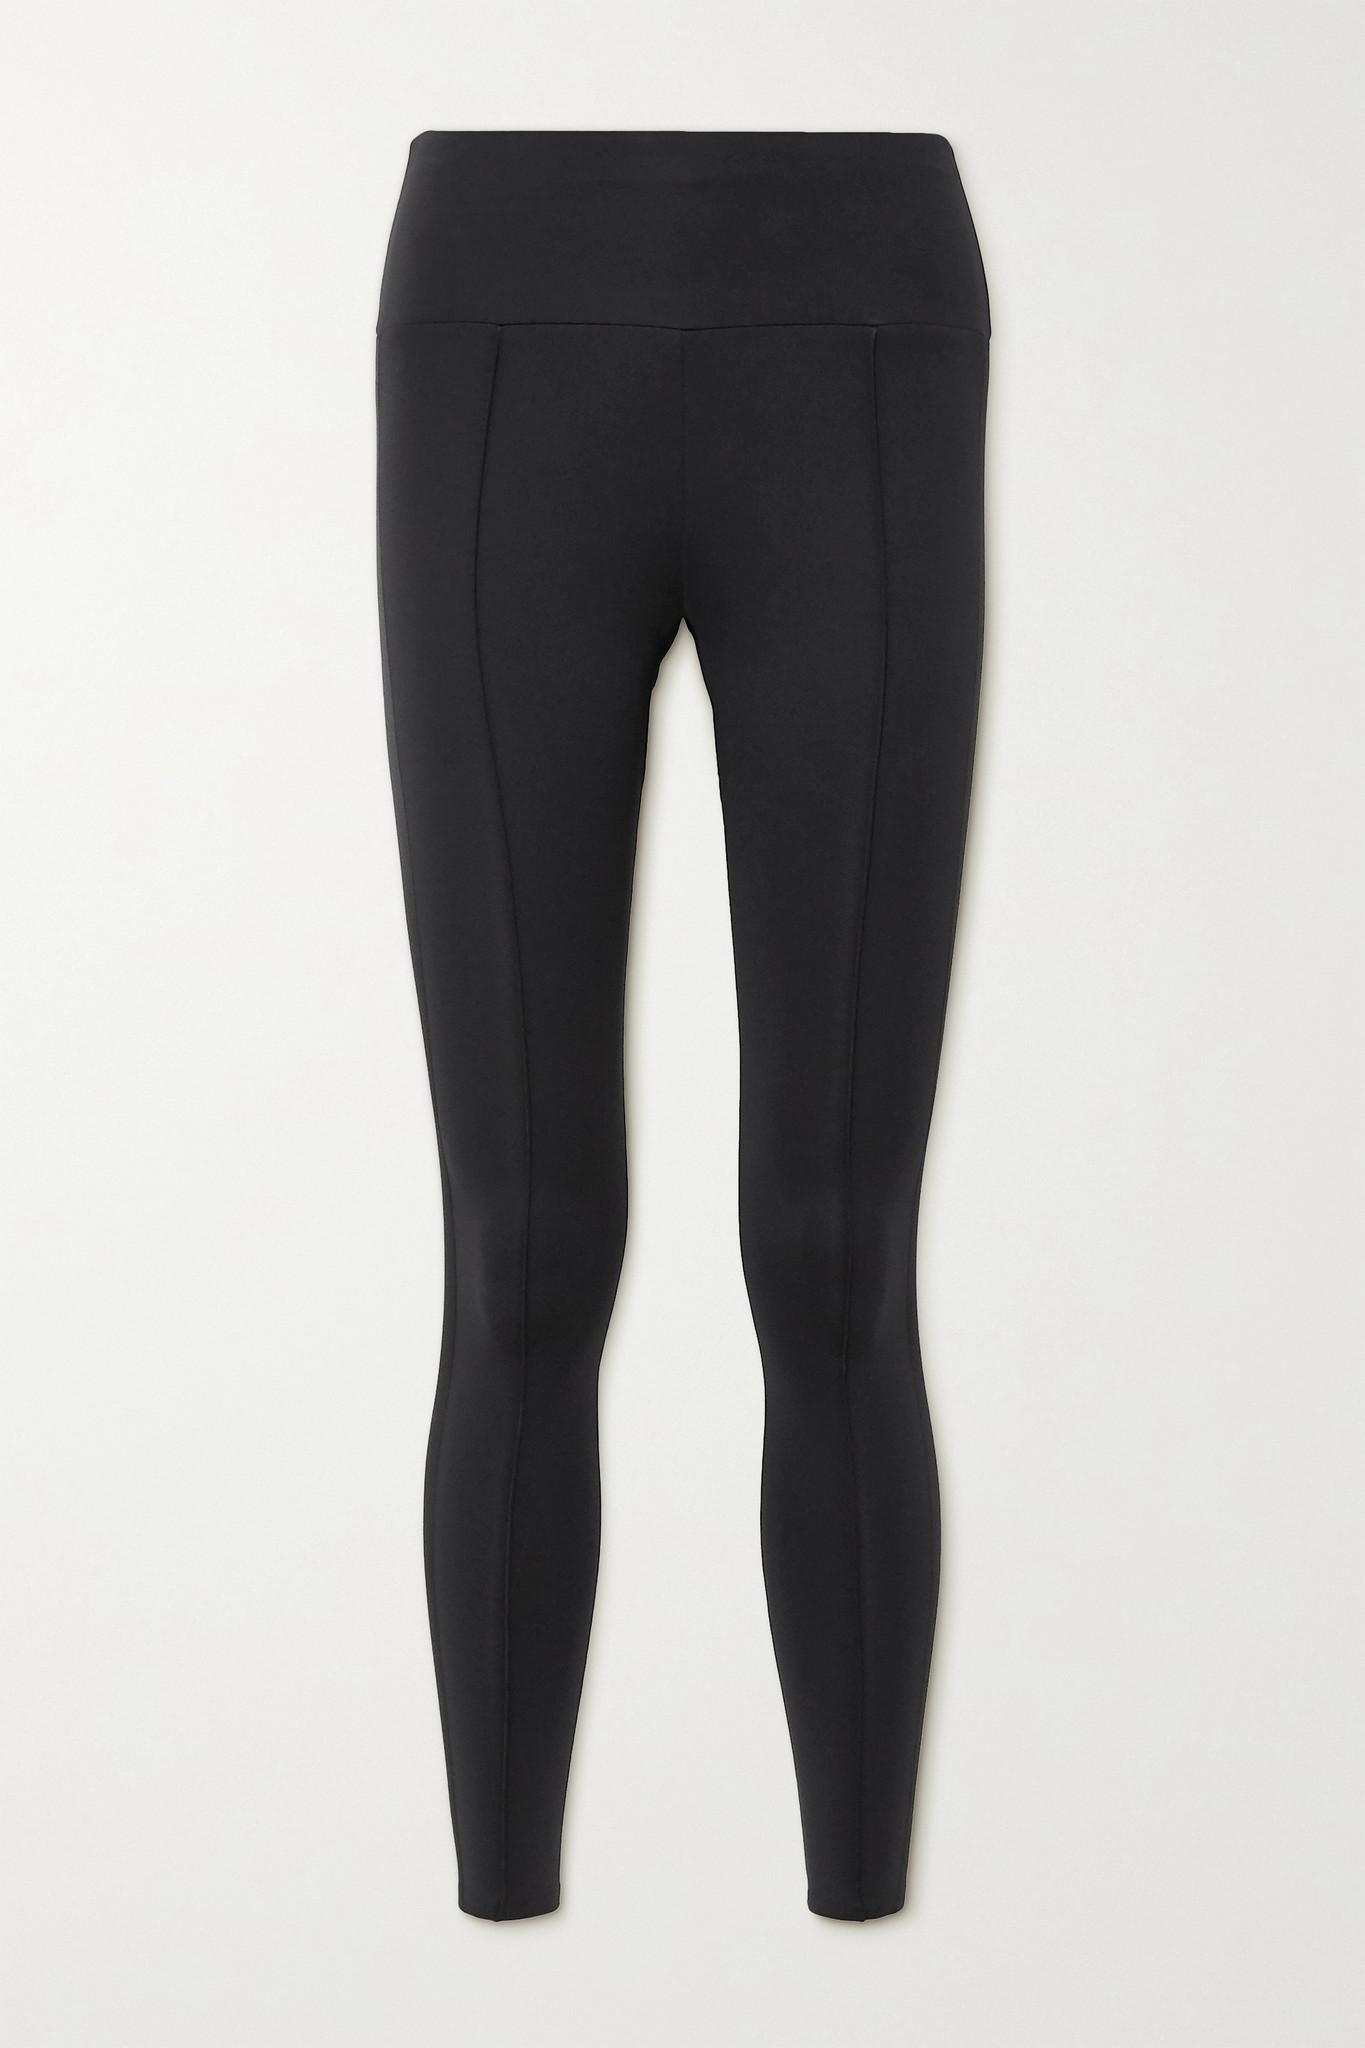 VAARA - Nica Satin-trimmed Stretch Leggings - Black - x small